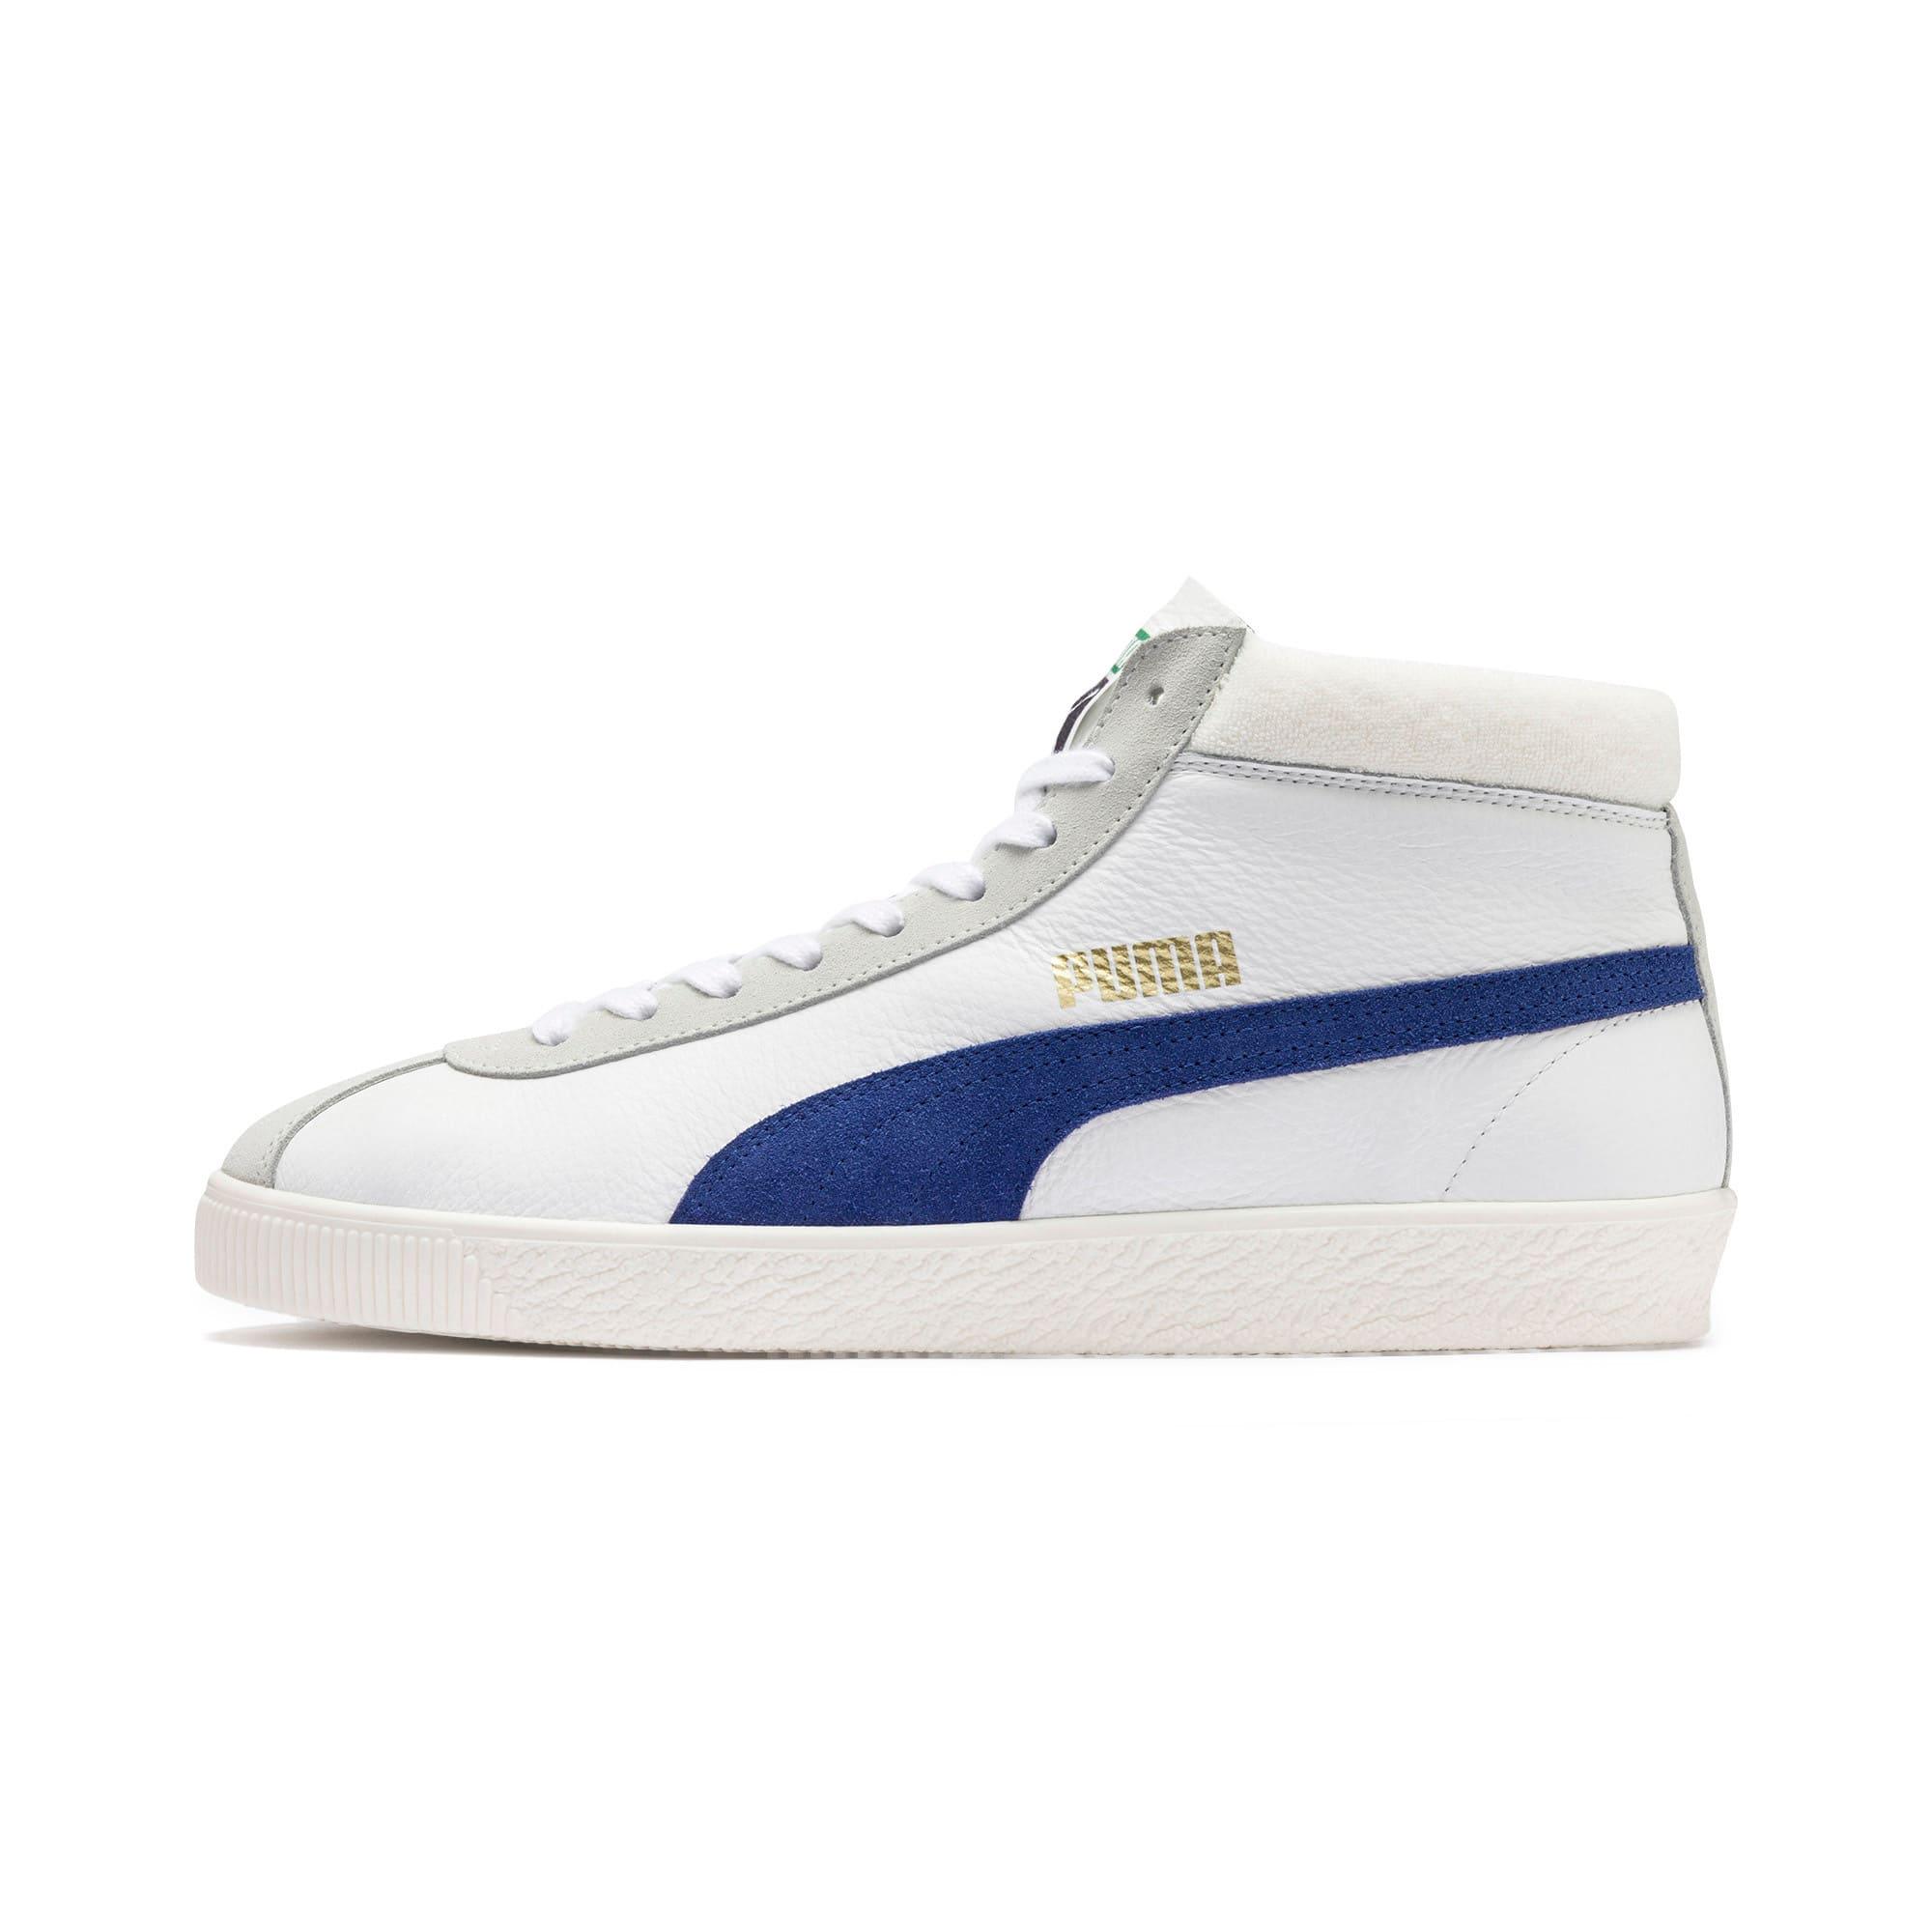 Thumbnail 1 of Halfhoge Basket '68 sportschoenen, Puma White-Galaxy Blue, medium